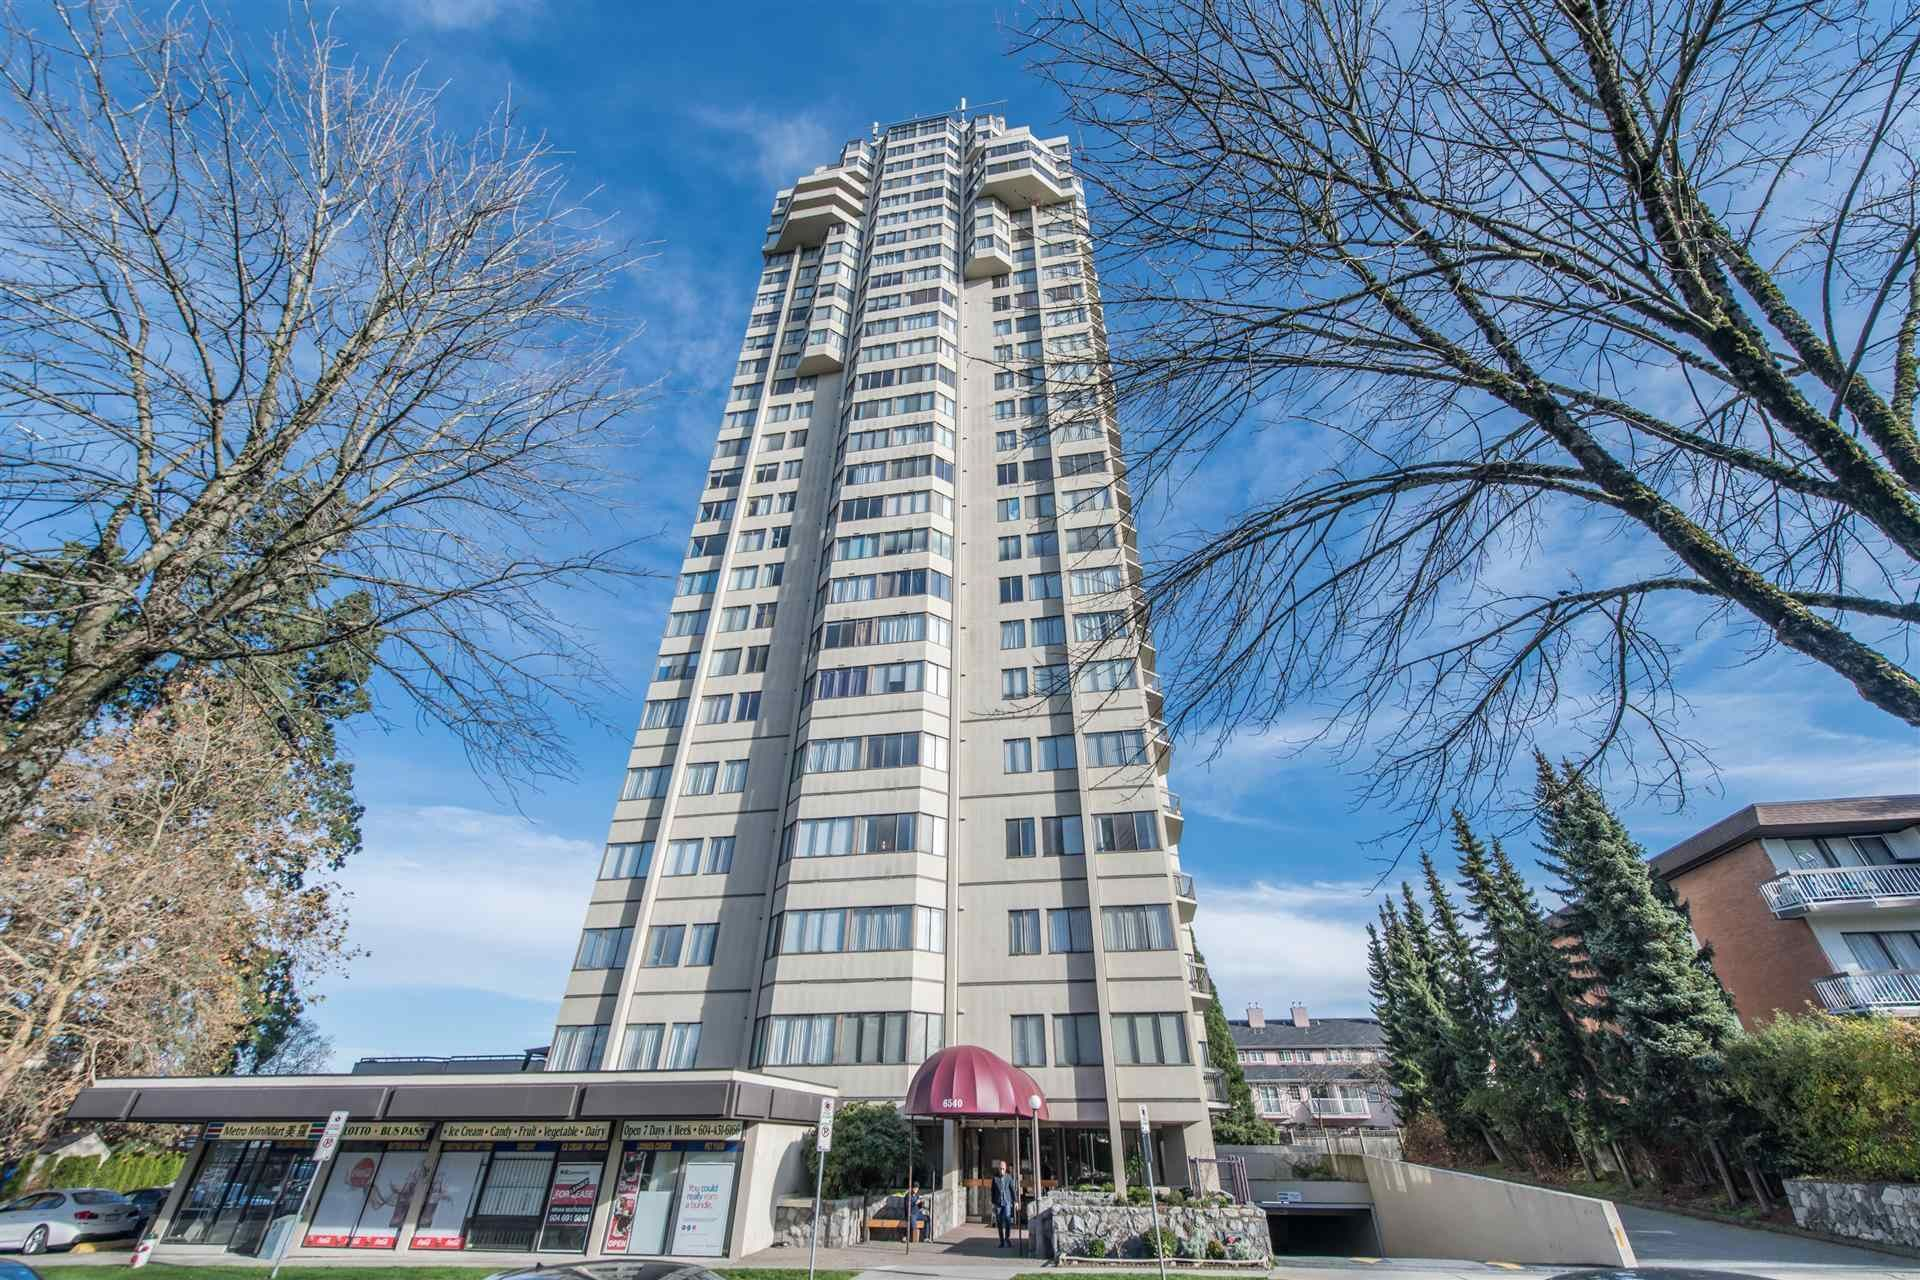 Main Photo: 1903 6540 BURLINGTON AVENUE in Burnaby: Metrotown Condo for sale (Burnaby South)  : MLS®# R2600716